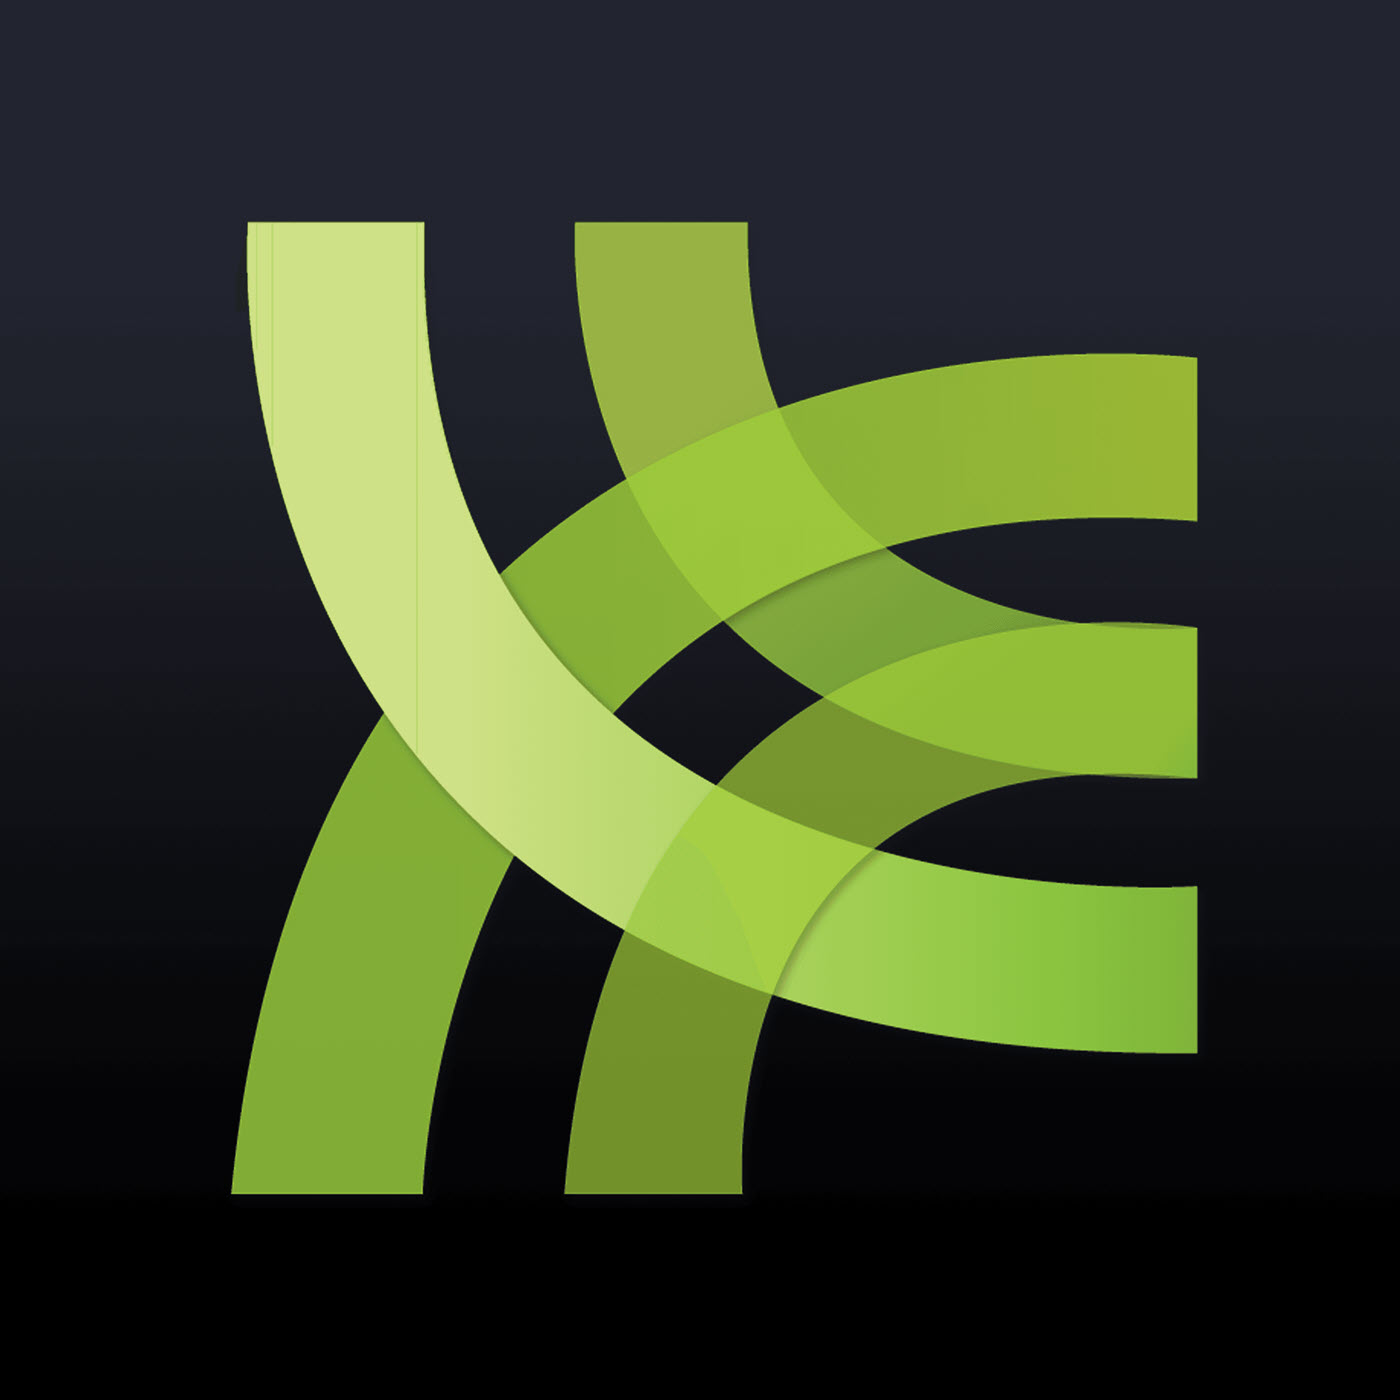 http://homedir-c.libsyn.com/podcasts/d61709236ab8f3371bb8ceca679f3fa3/4b508890/badatsports/images/chicken.jpg